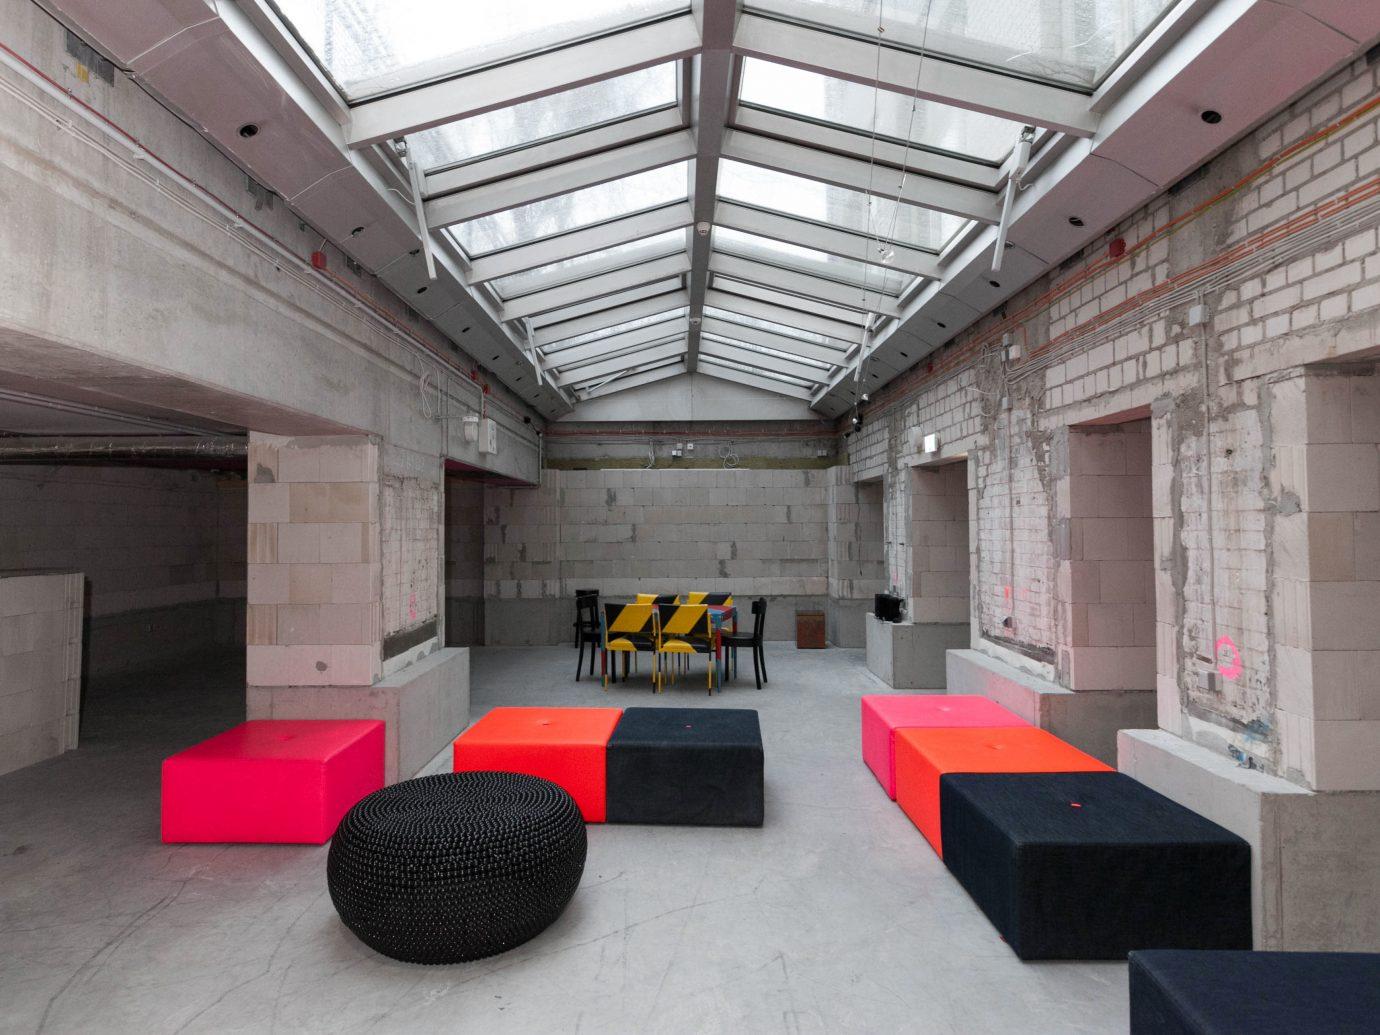 Berlin Boutique Hotels Germany Hotels Lobby Lounge Luxury Travel indoor floor interior design auditorium Design flooring furniture